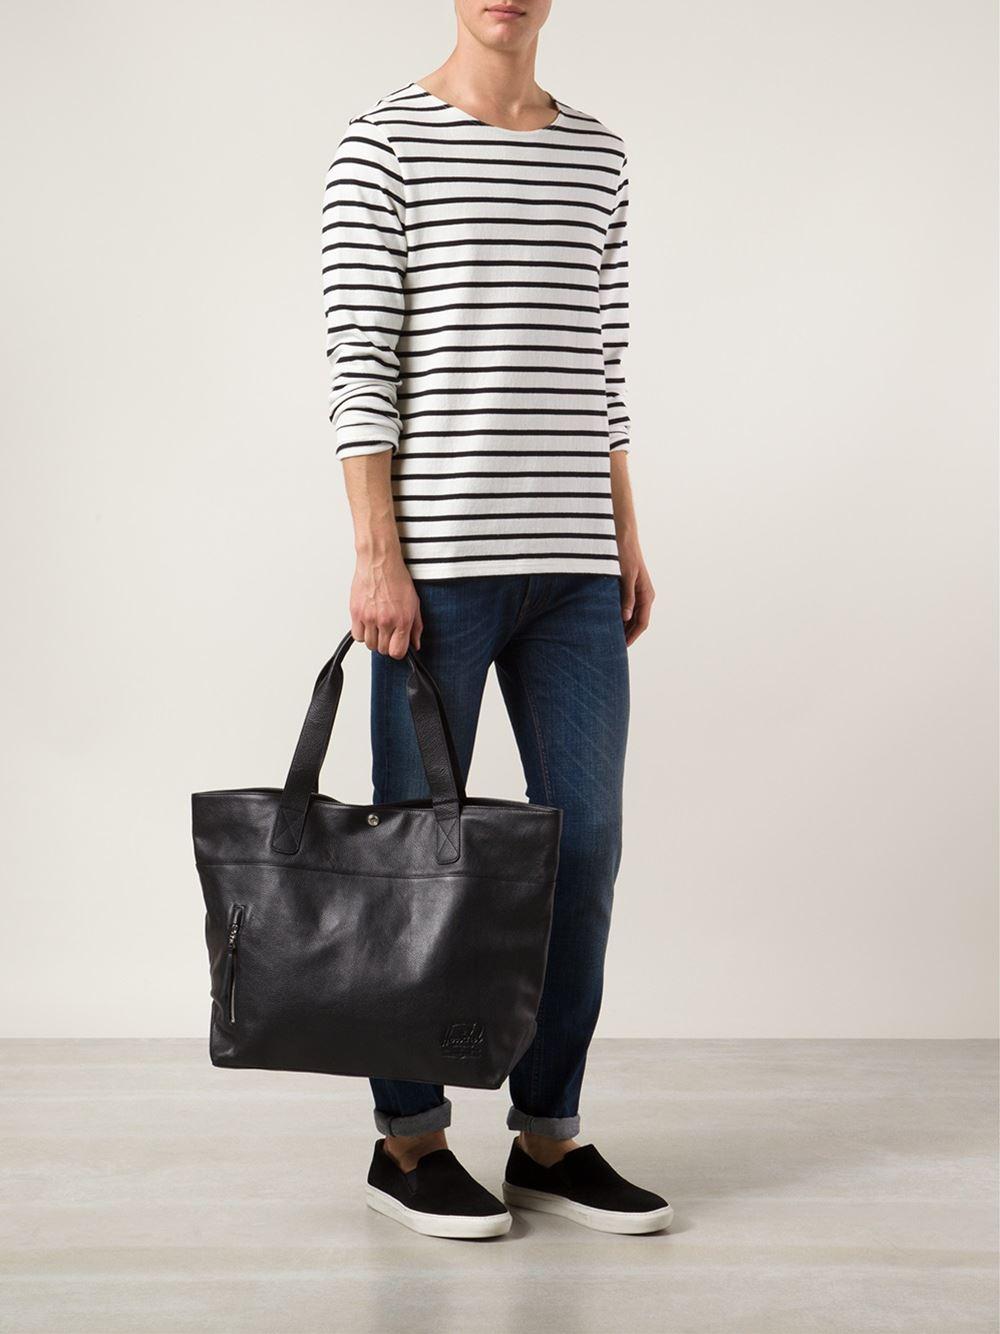 herschel, herschel supply, tote, mens bags, tote bags, shopping